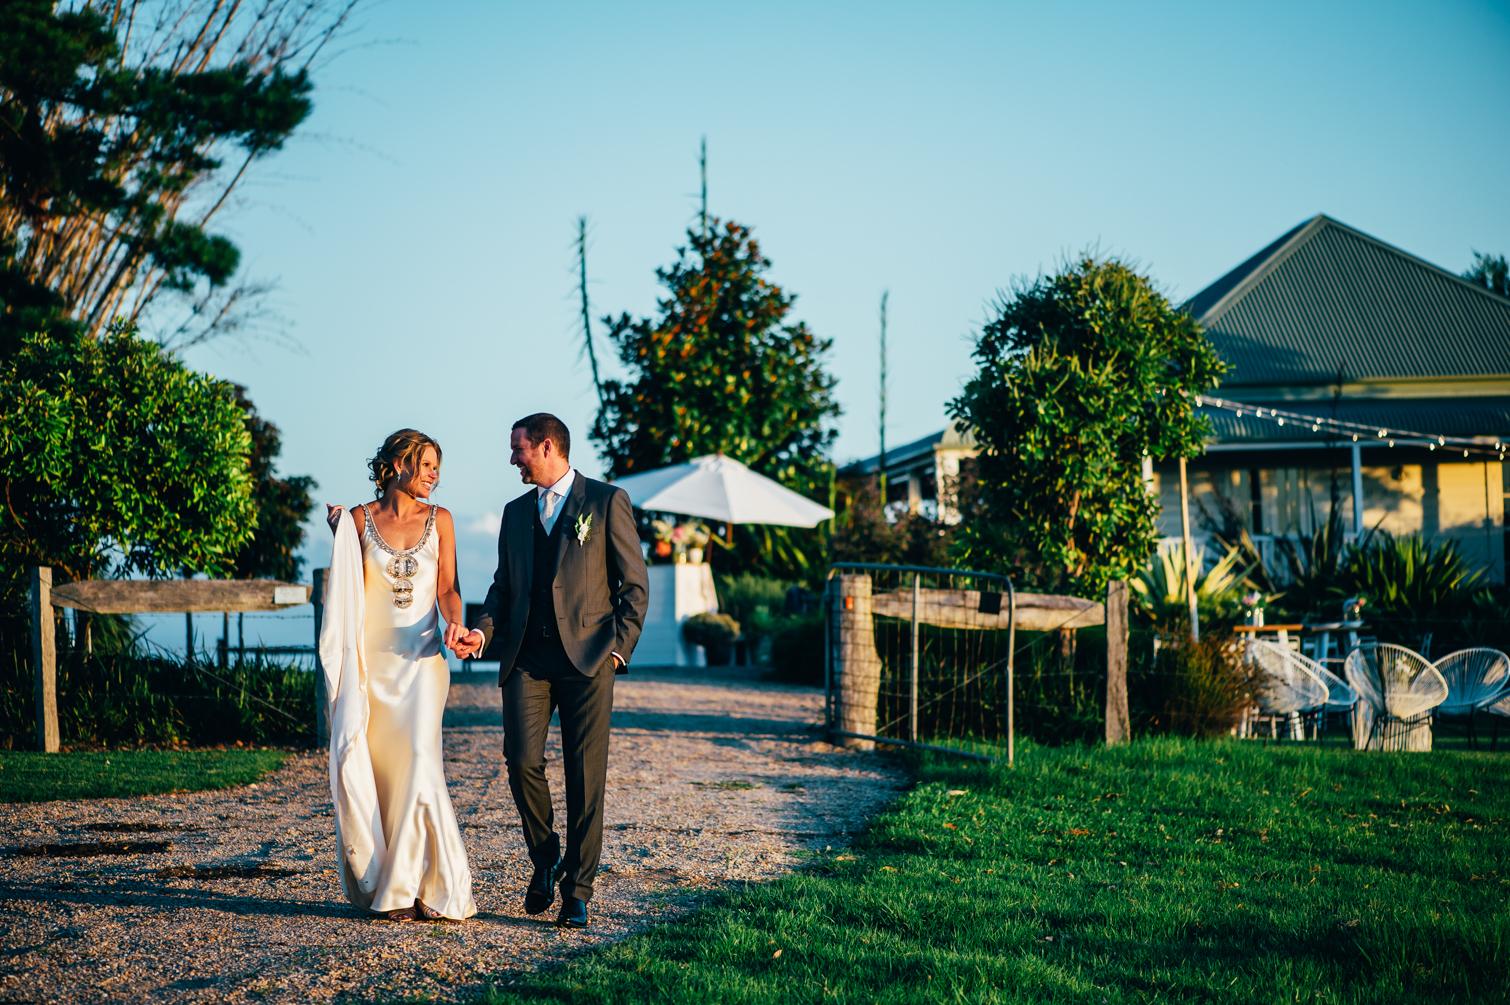 Byron_View_Wedding_Venue-45.jpg